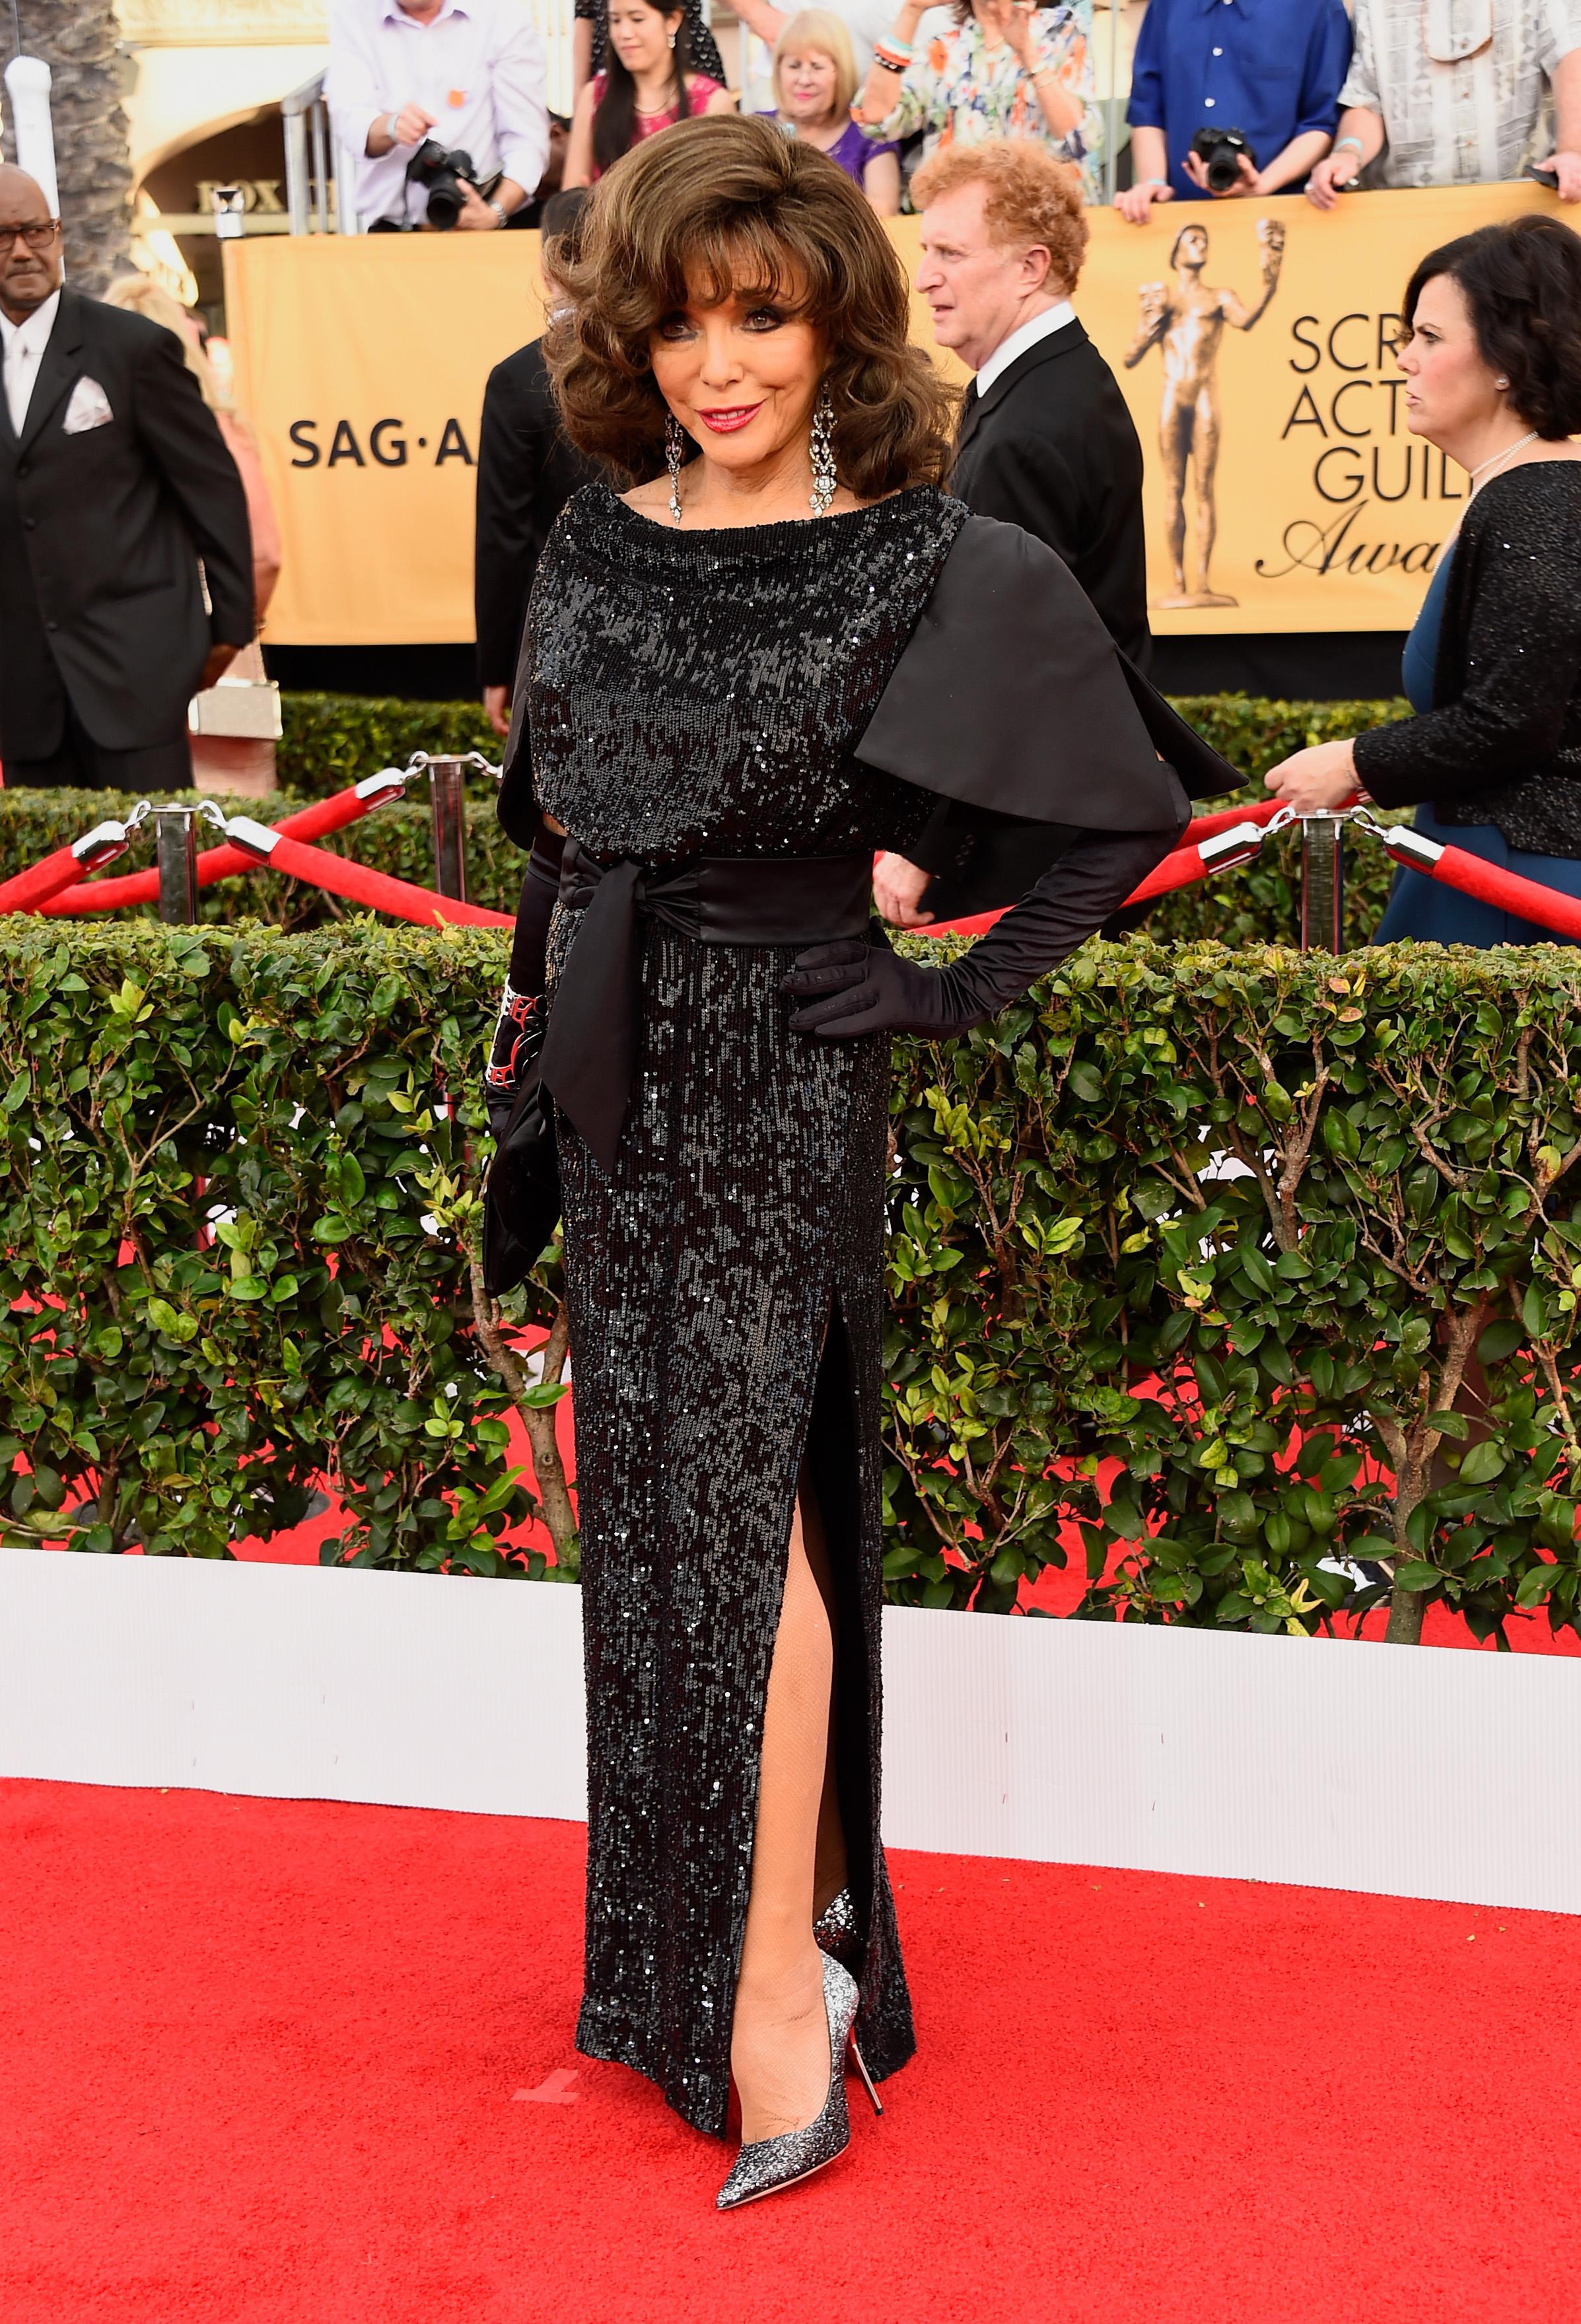 SAG Awards Alexisly Played: Joan Collins - Go Fug Yourself